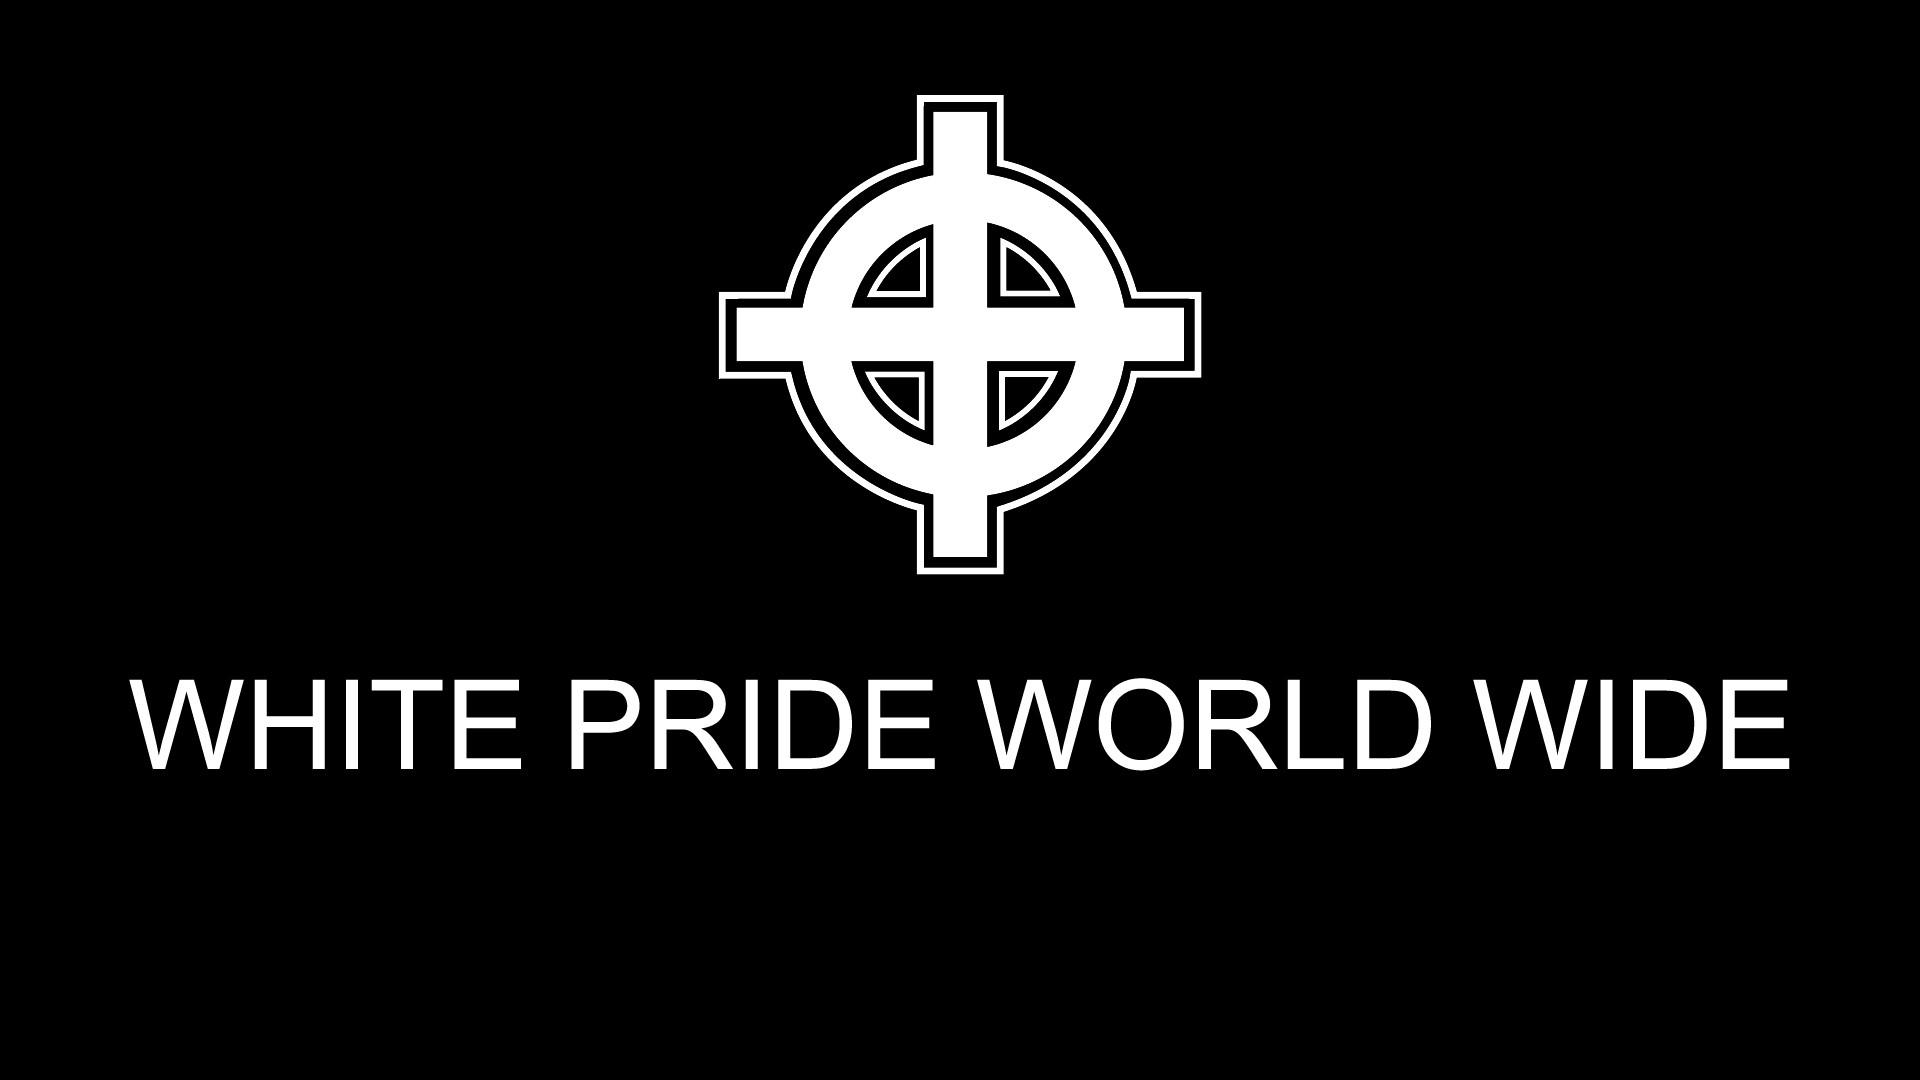 White Pride Wallpaper 59 images